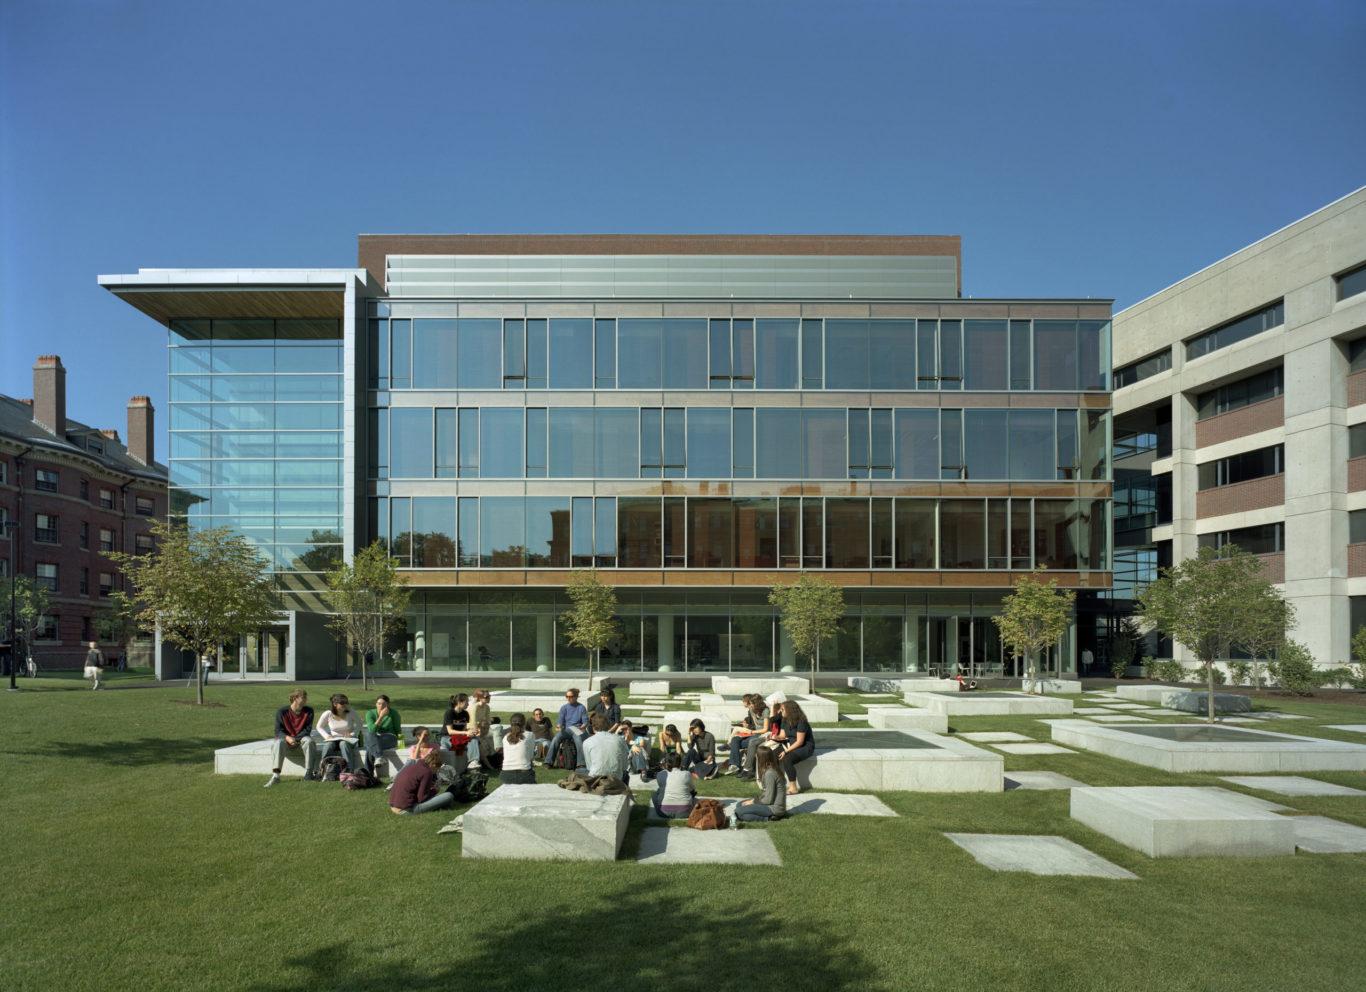 Slide 1 of 1, Harvard University Northwest Science Building